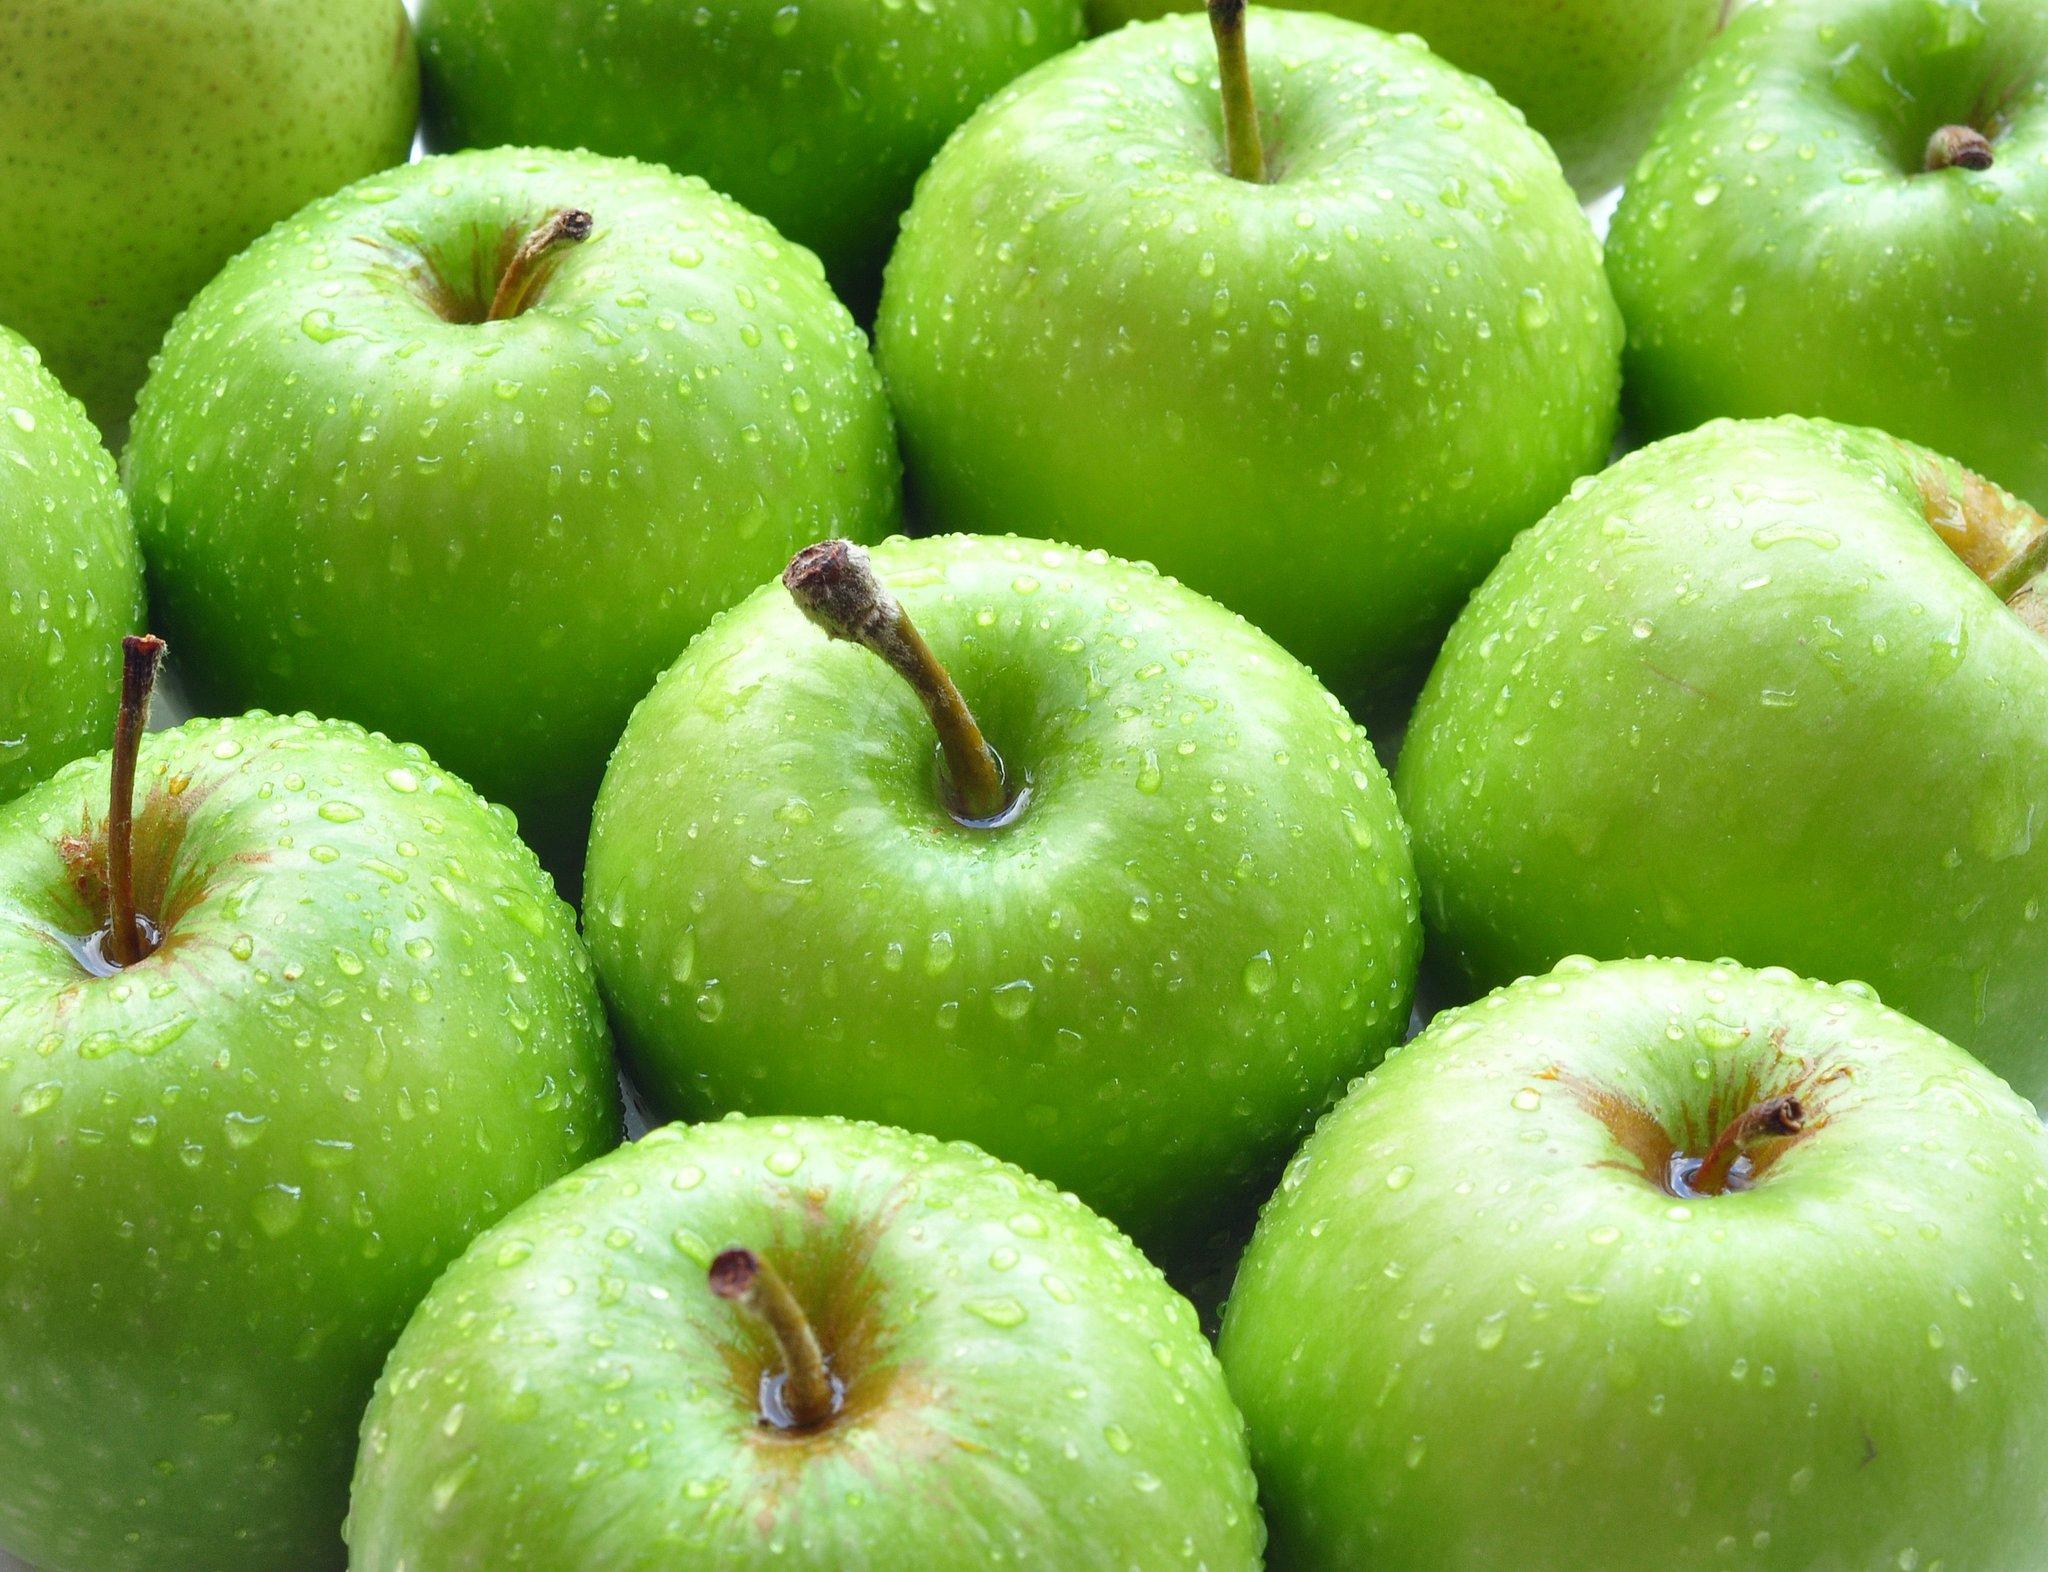 картинки на тему яблок быстро просто без